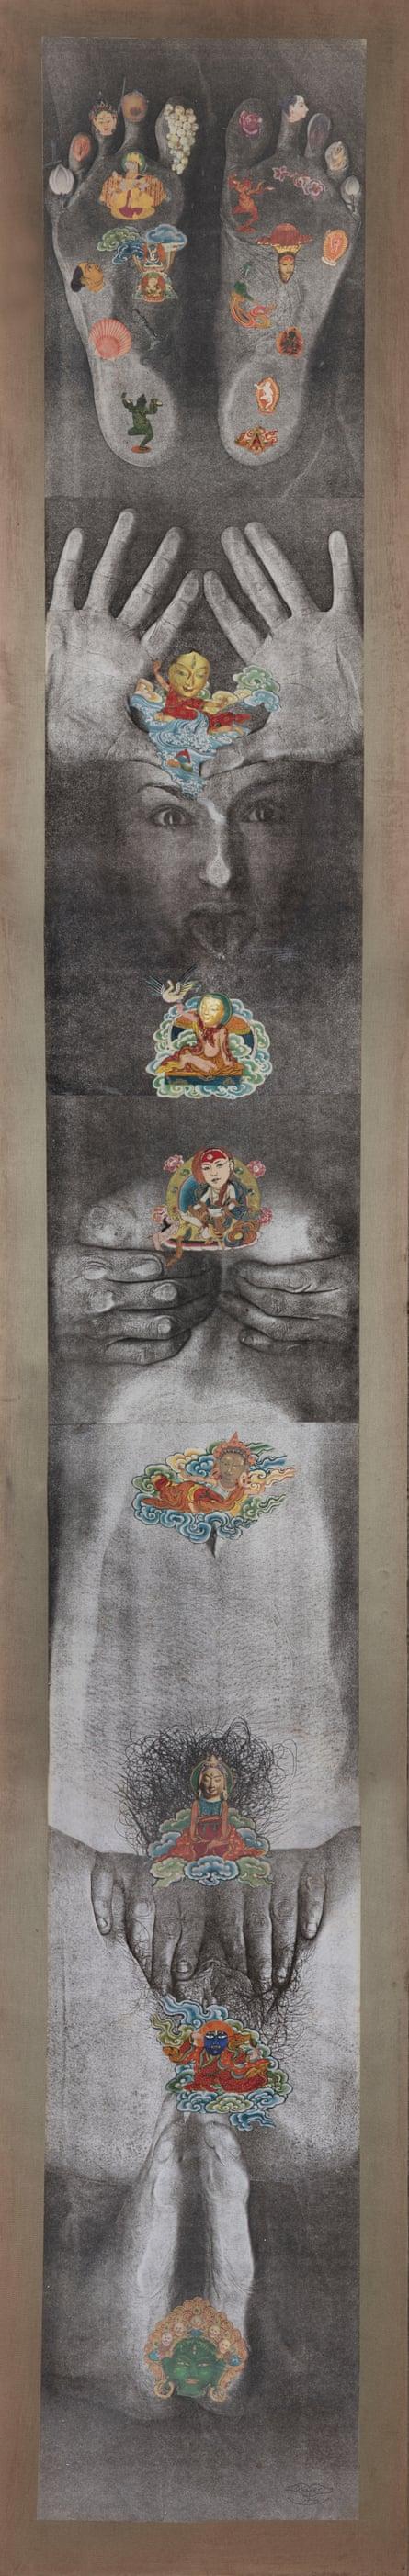 Penny Slinger's Chakra Woman, 1976.